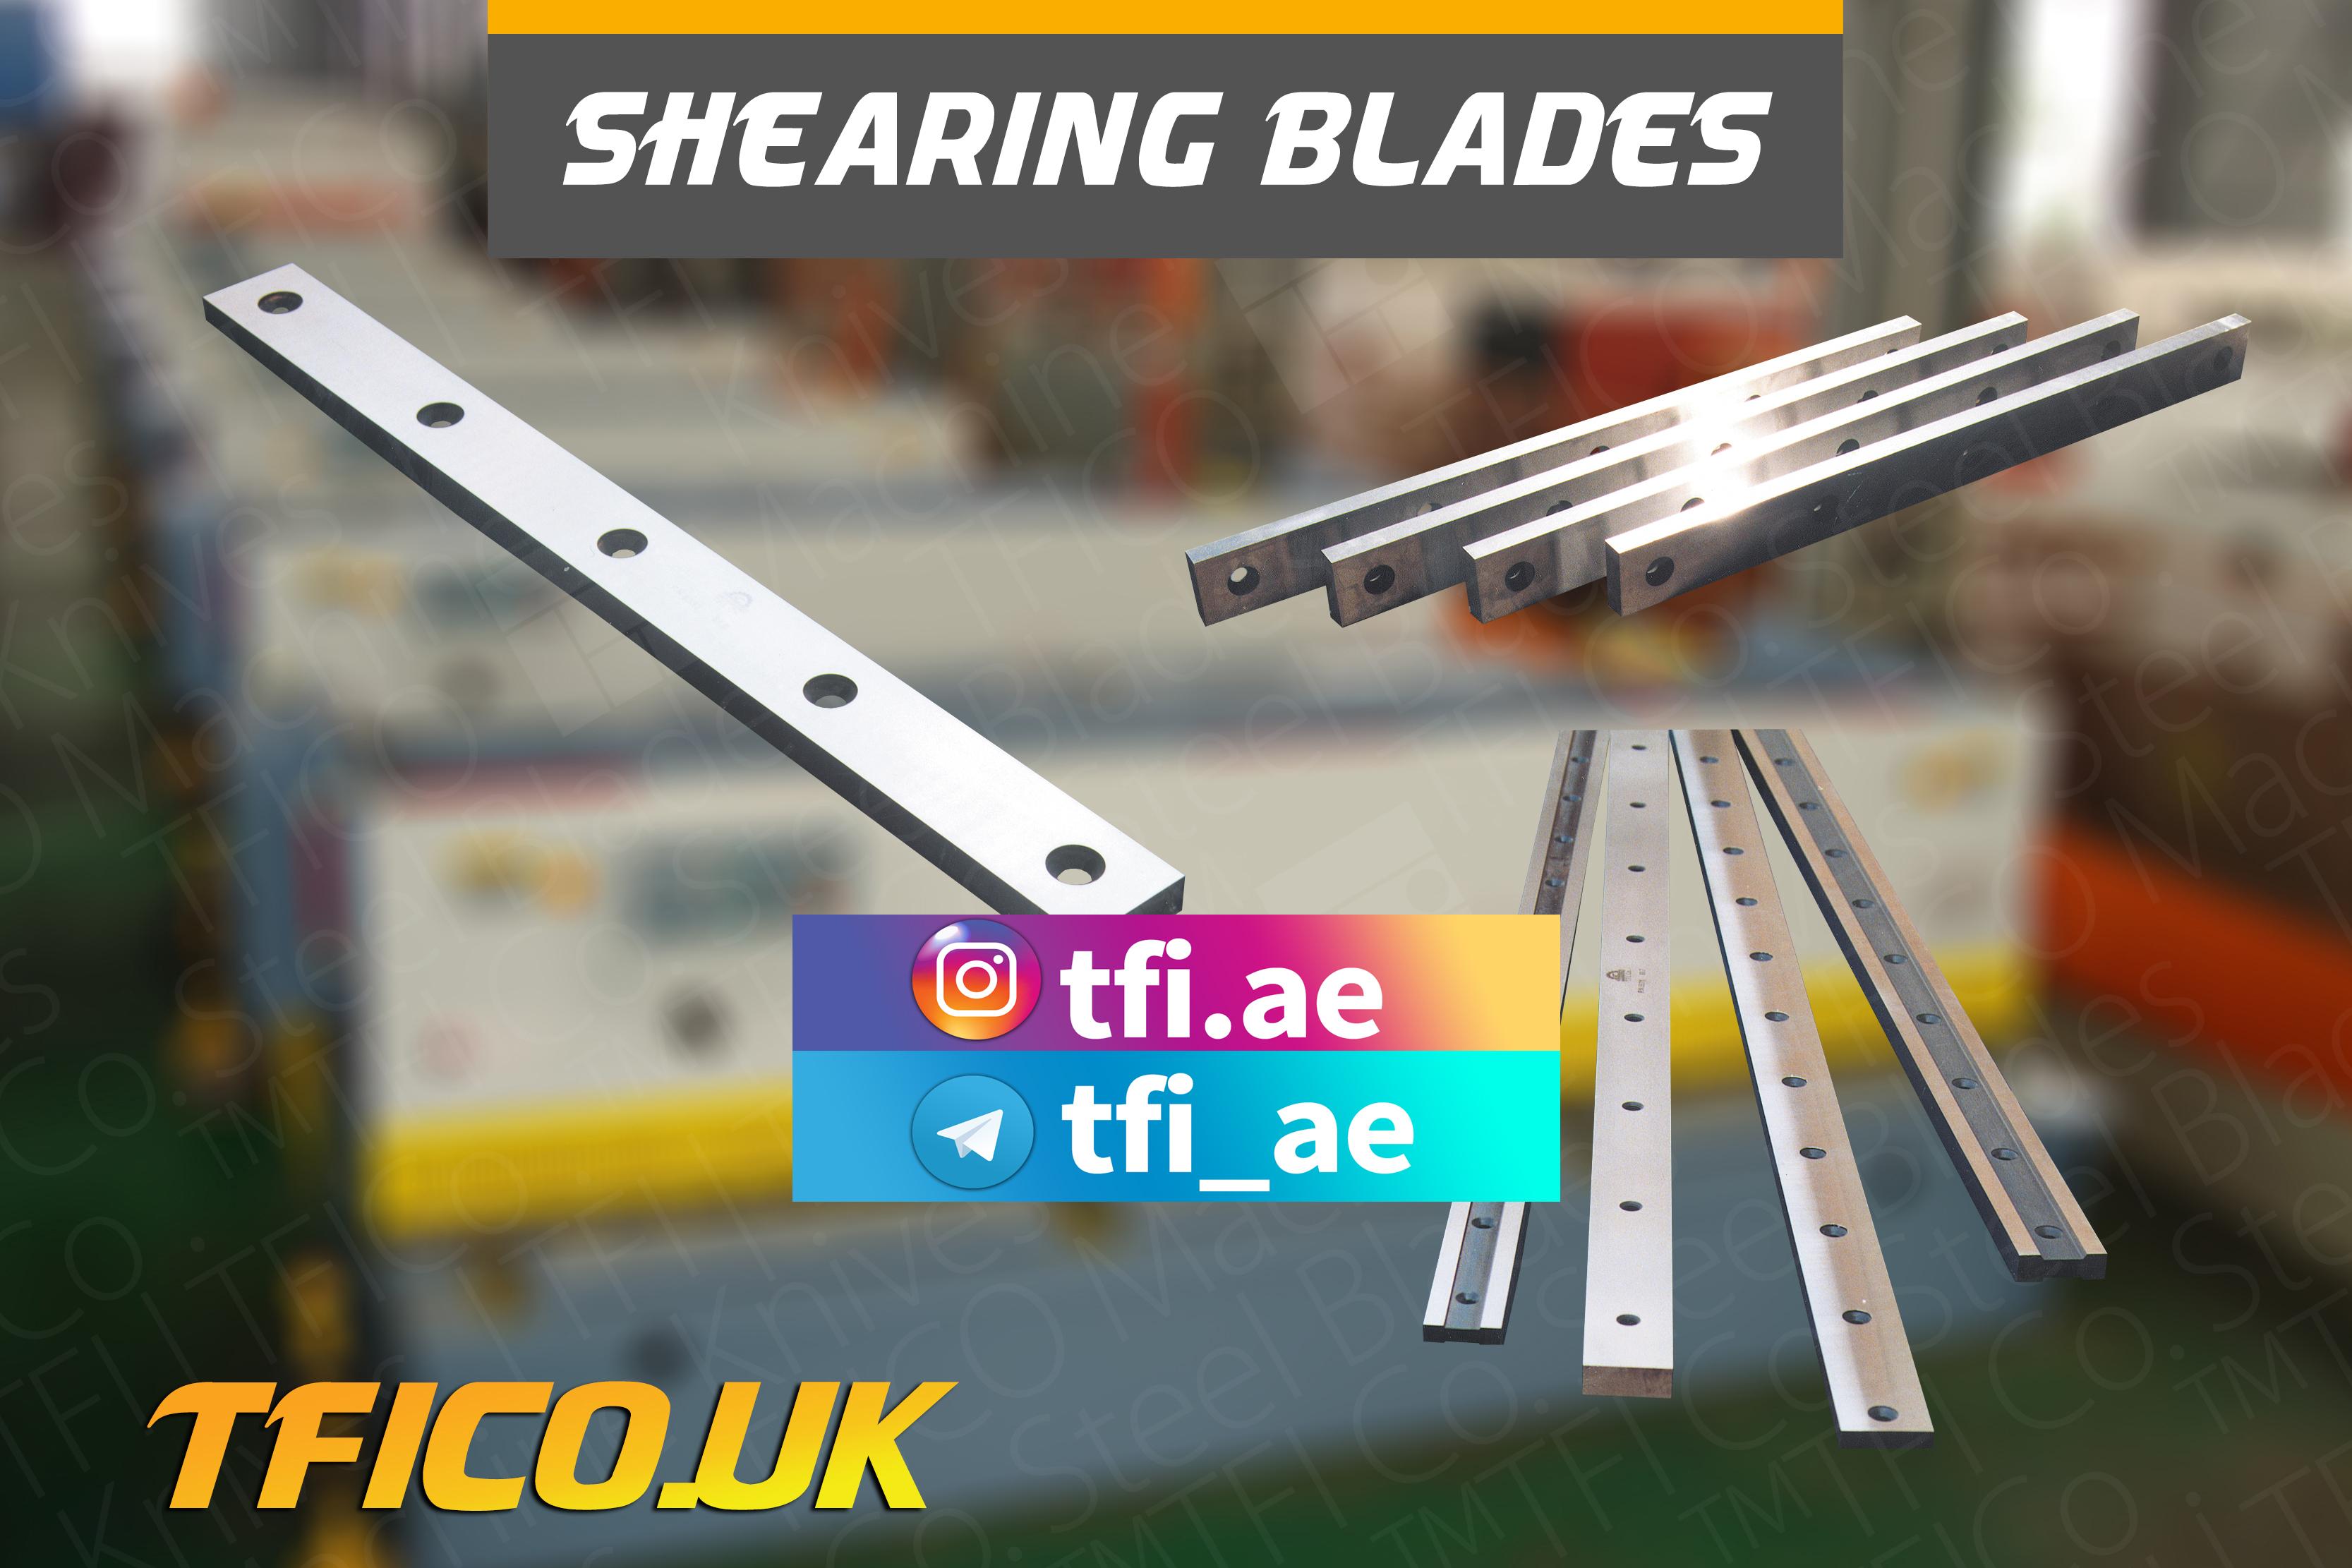 shear knives, steel blade, stell blades ,tfico, remscheid, tfico, germany, uk , unite kingdom, london, machine knives, Sheffield , sydney,